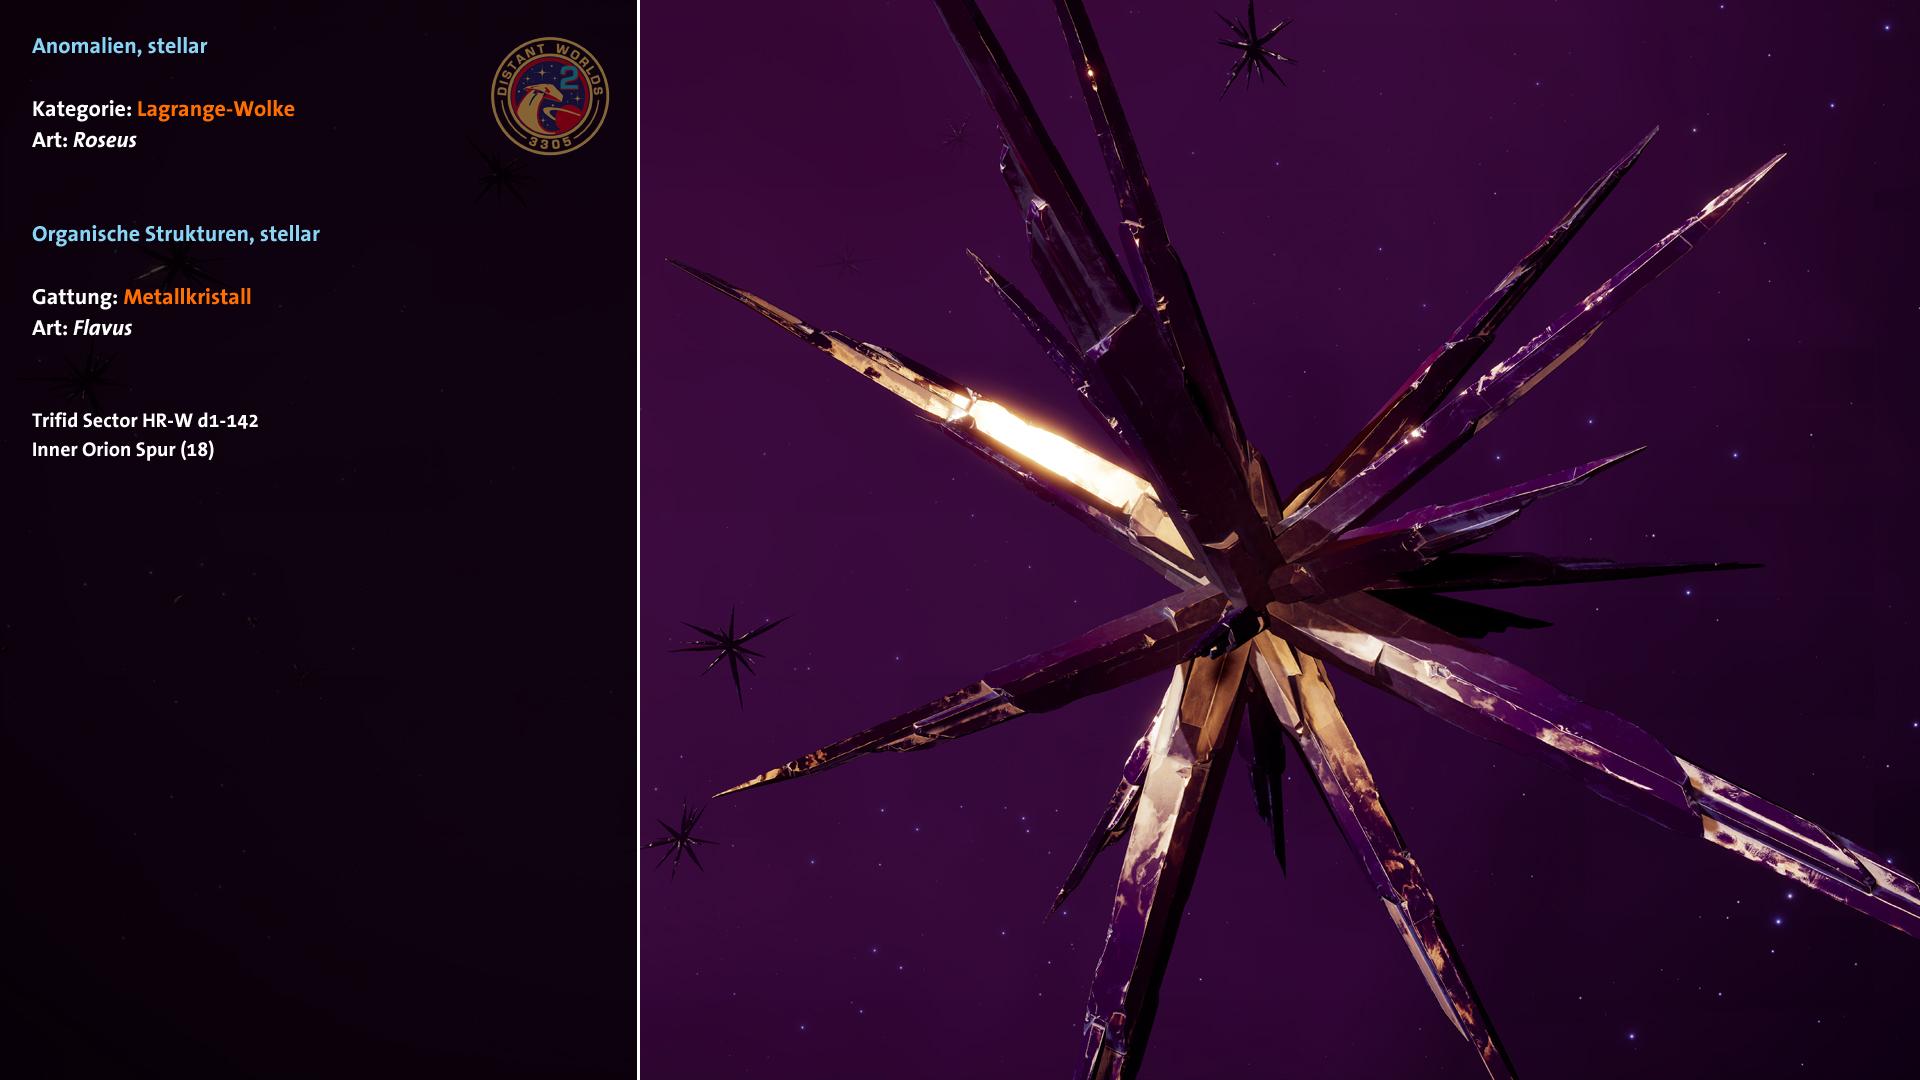 dw2-01-022-biostellar.jpg